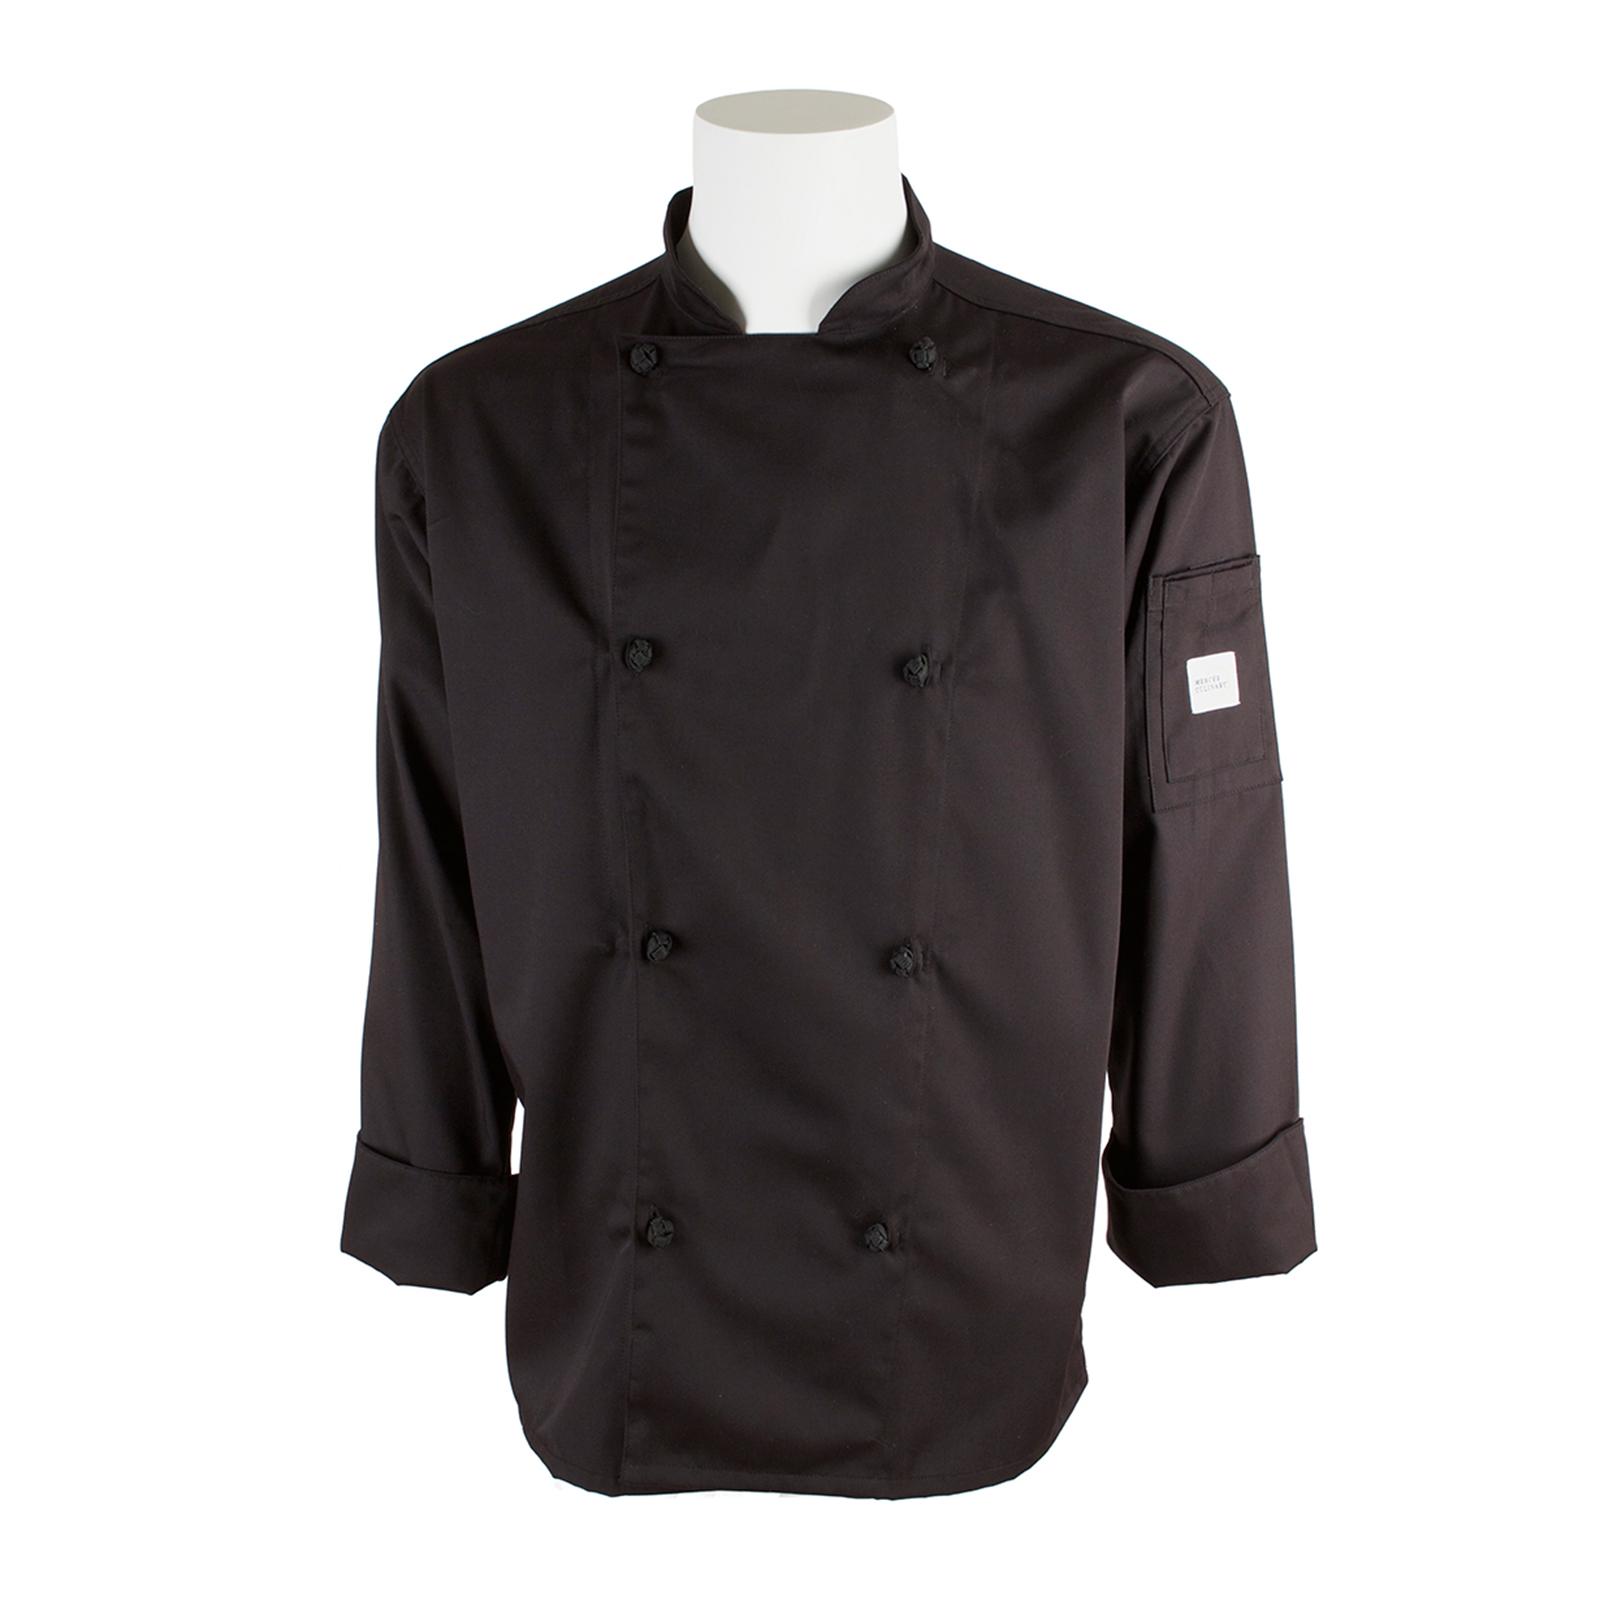 Mercer Culinary M61020BKXS chef's coat